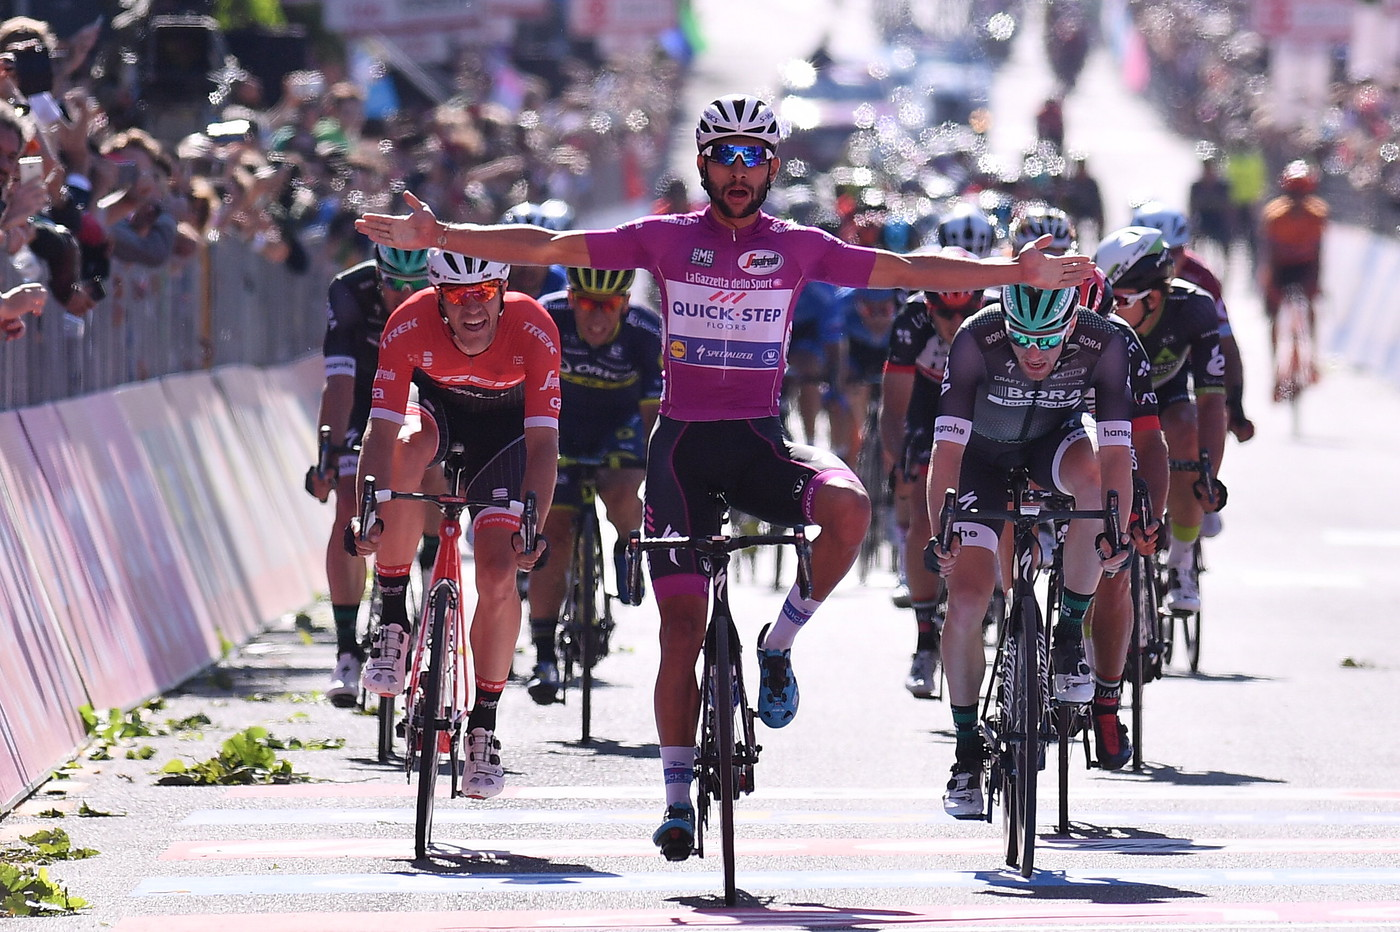 Gavira celebrates wins Stage 13 Giro 2017